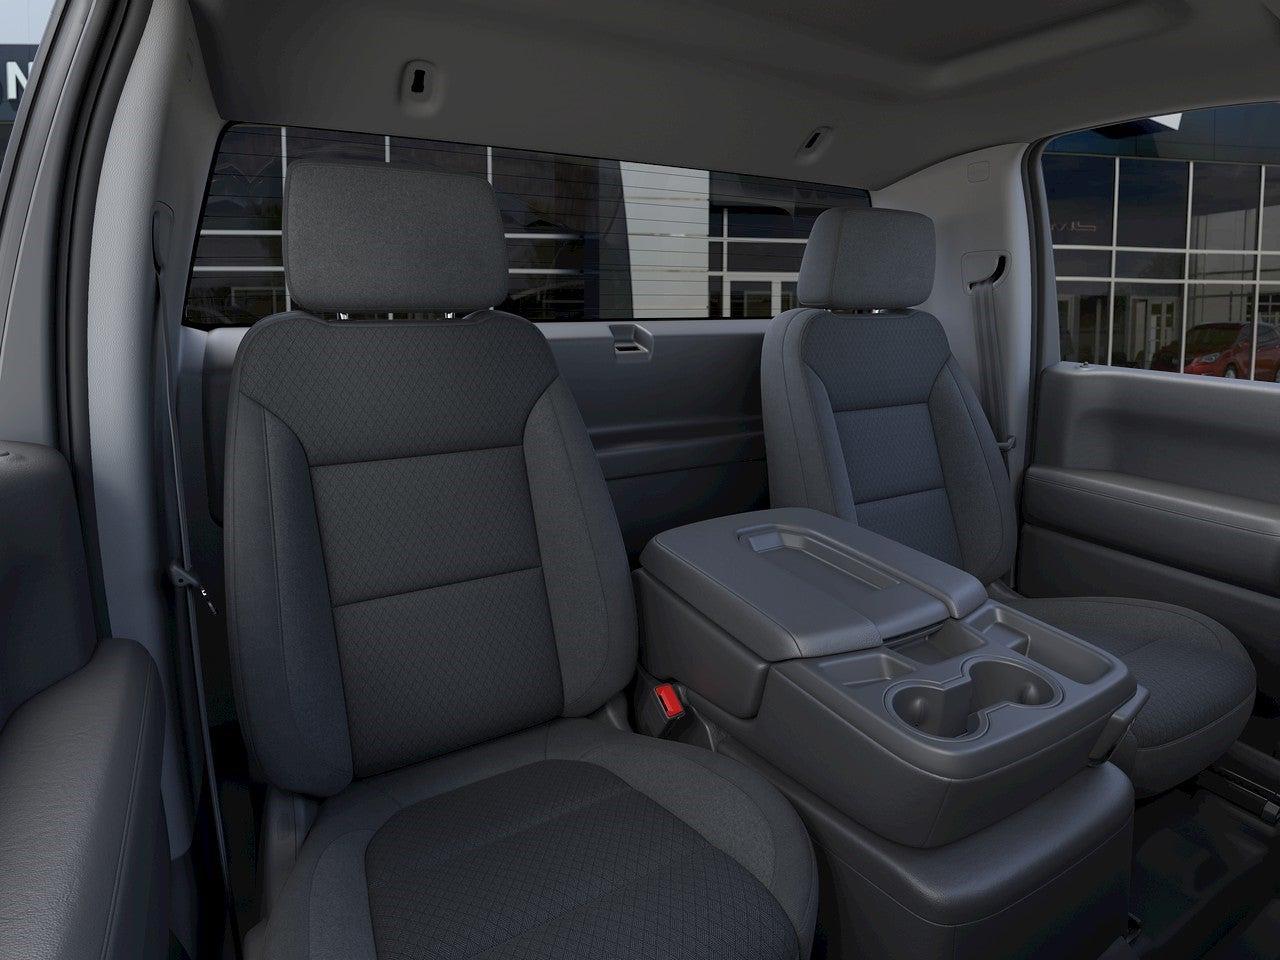 2021 GMC Sierra 1500 Regular Cab 4x4, Pickup #V21180 - photo 33